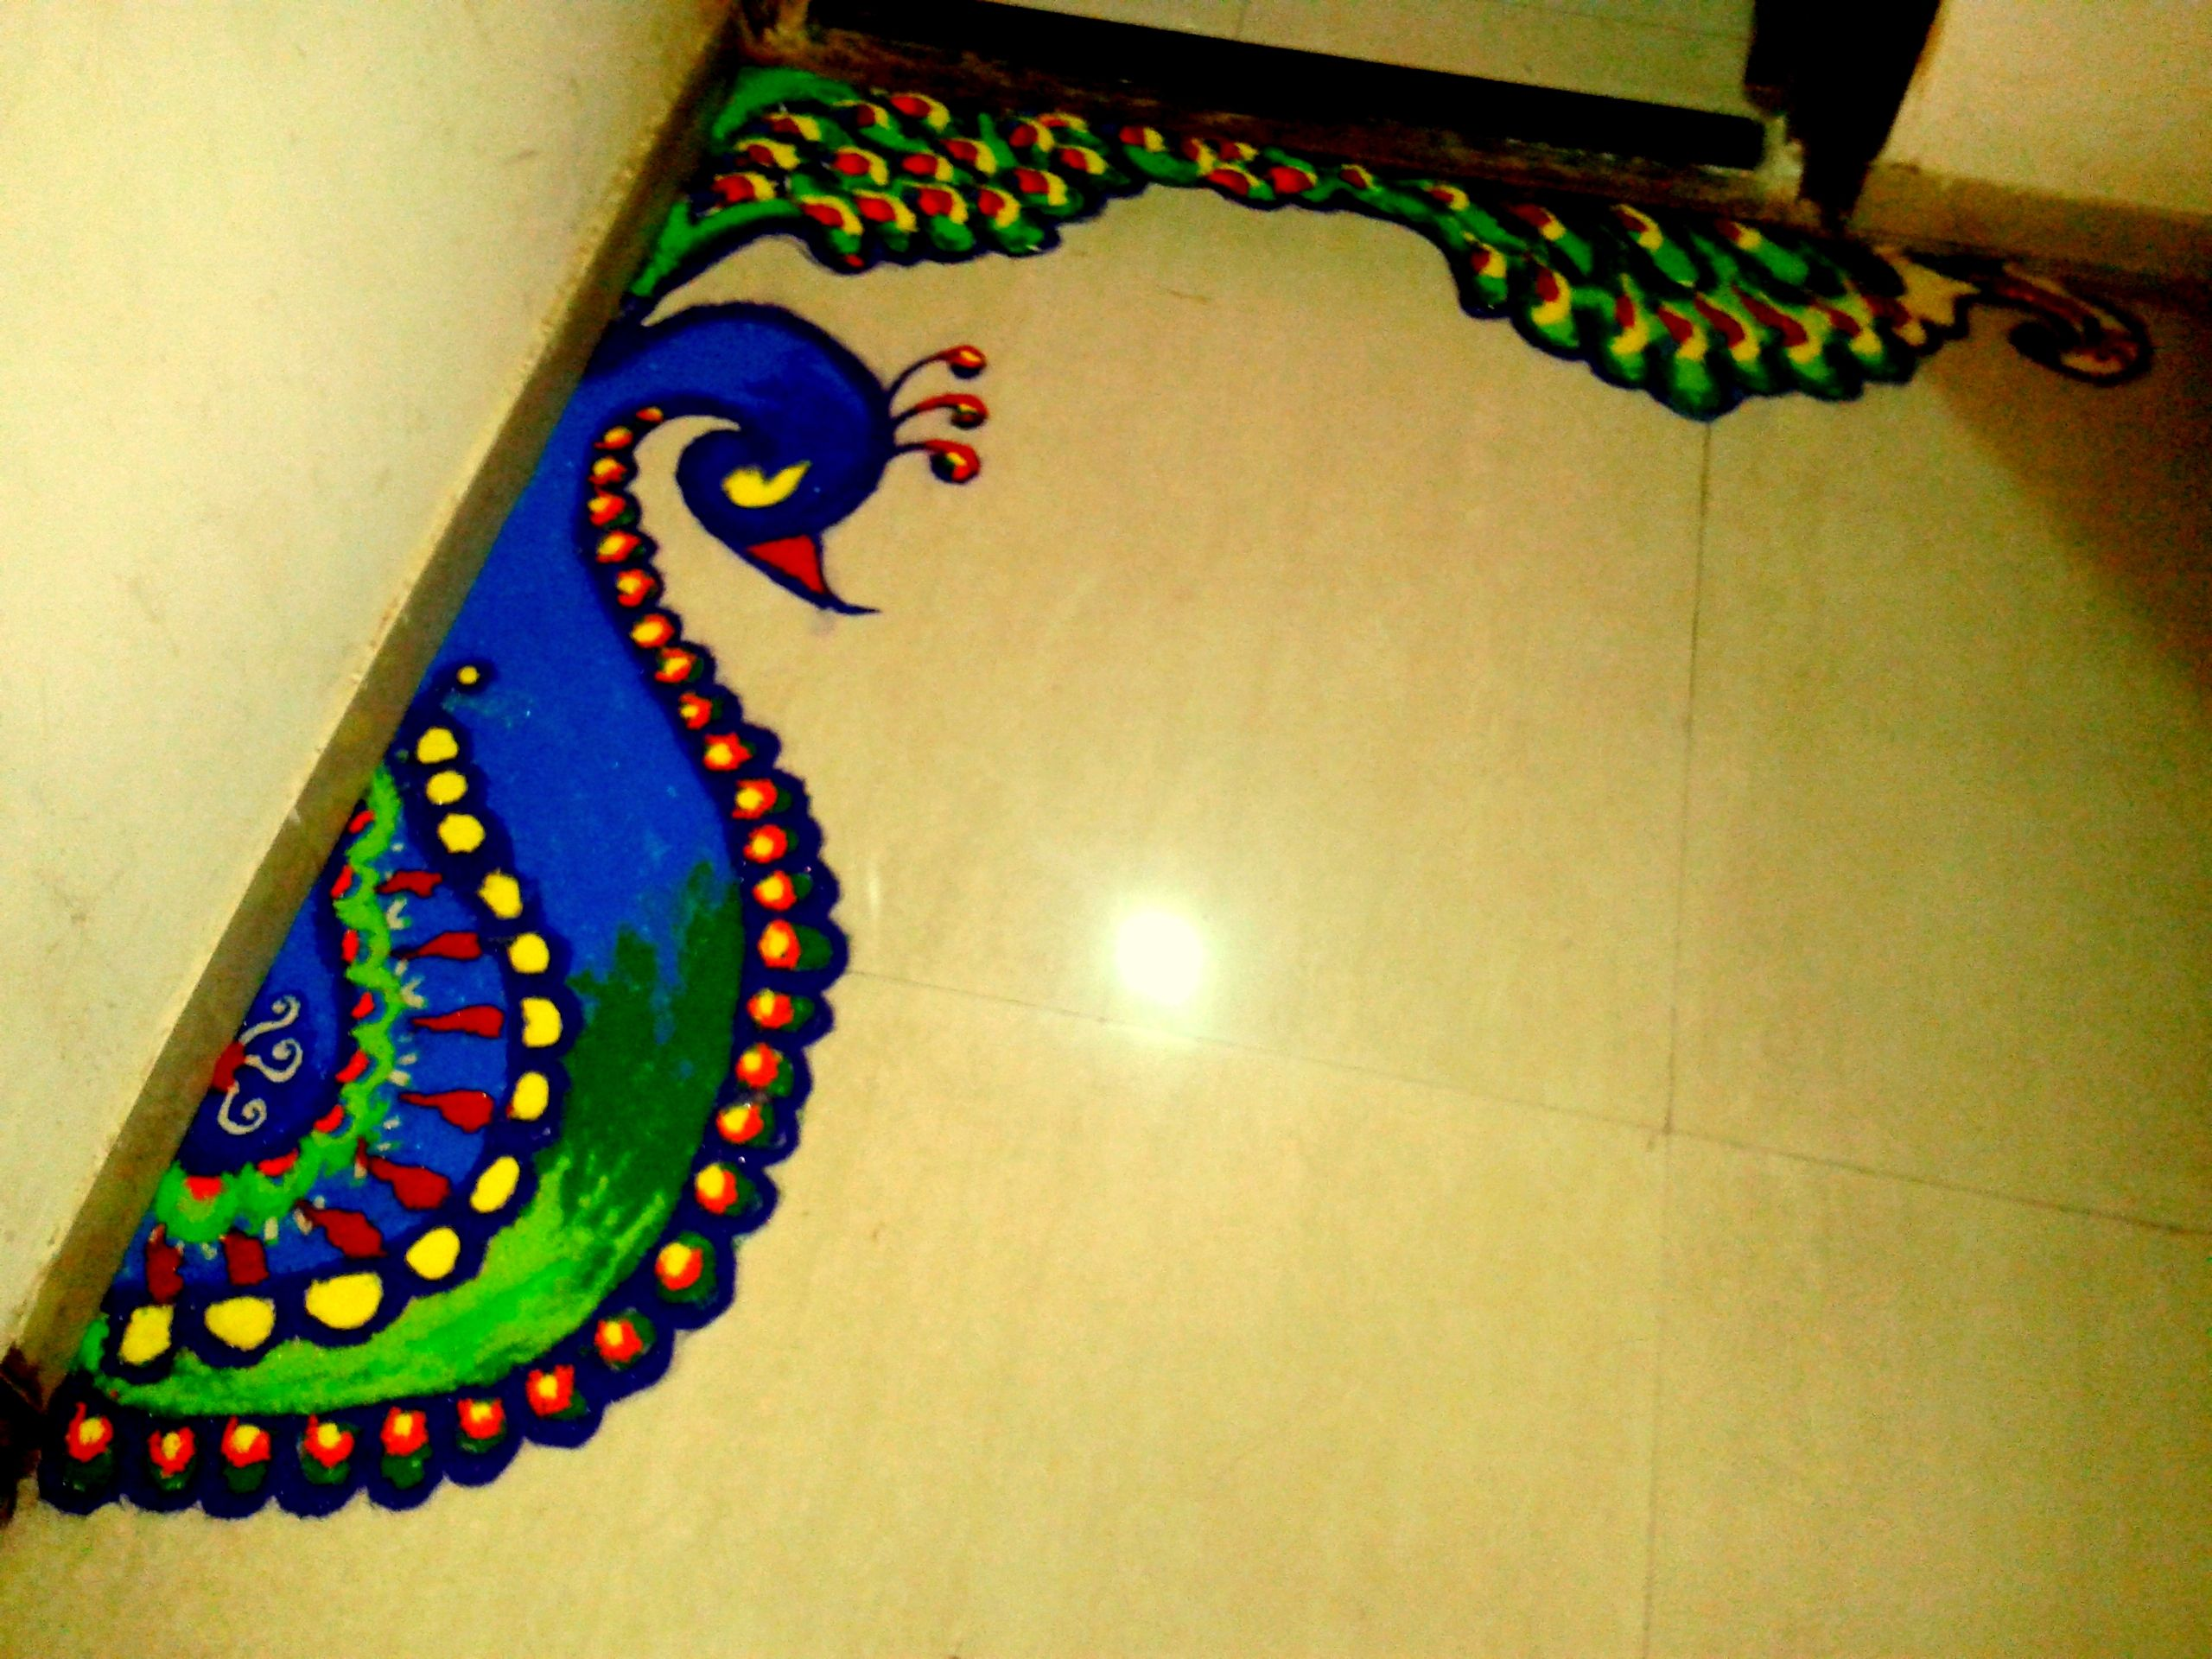 sand colours rangoli arts spot pinterest diwali rangoli special diwali floor decoration ideas to make your diwali 2016 wonderful these classic diwali decor ideas include floor decoration diwali home decor diwali